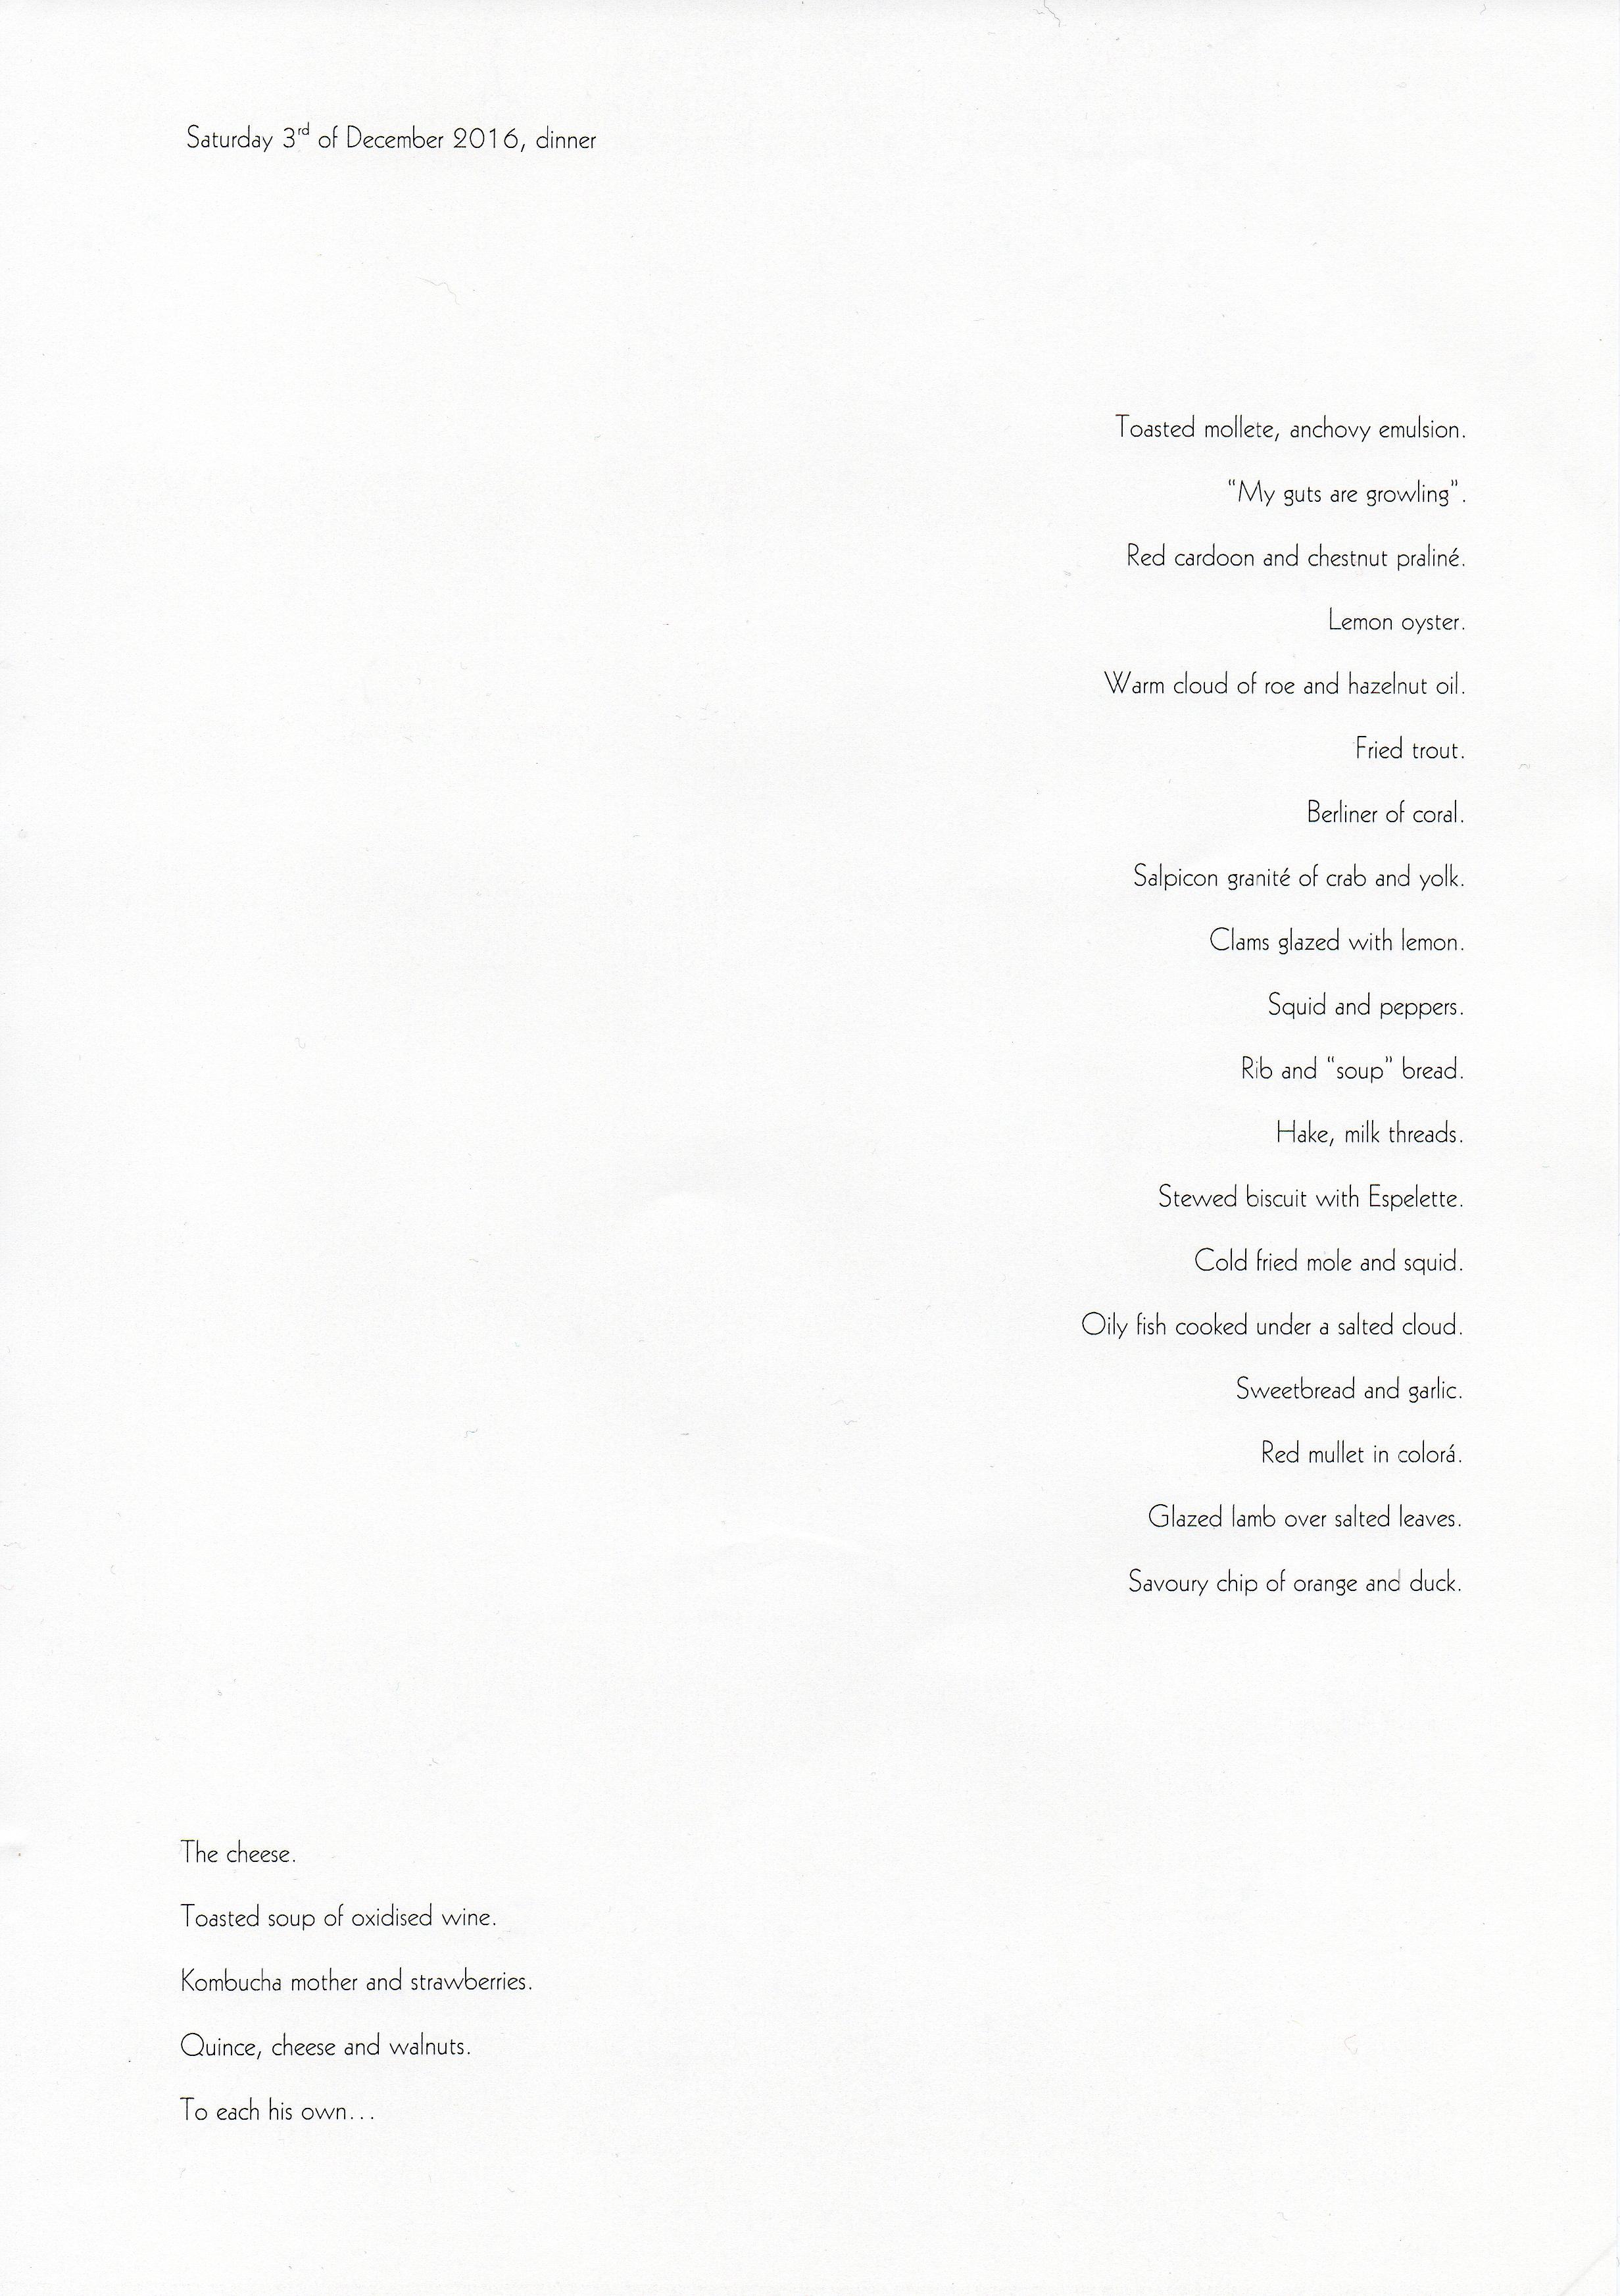 Adult menu